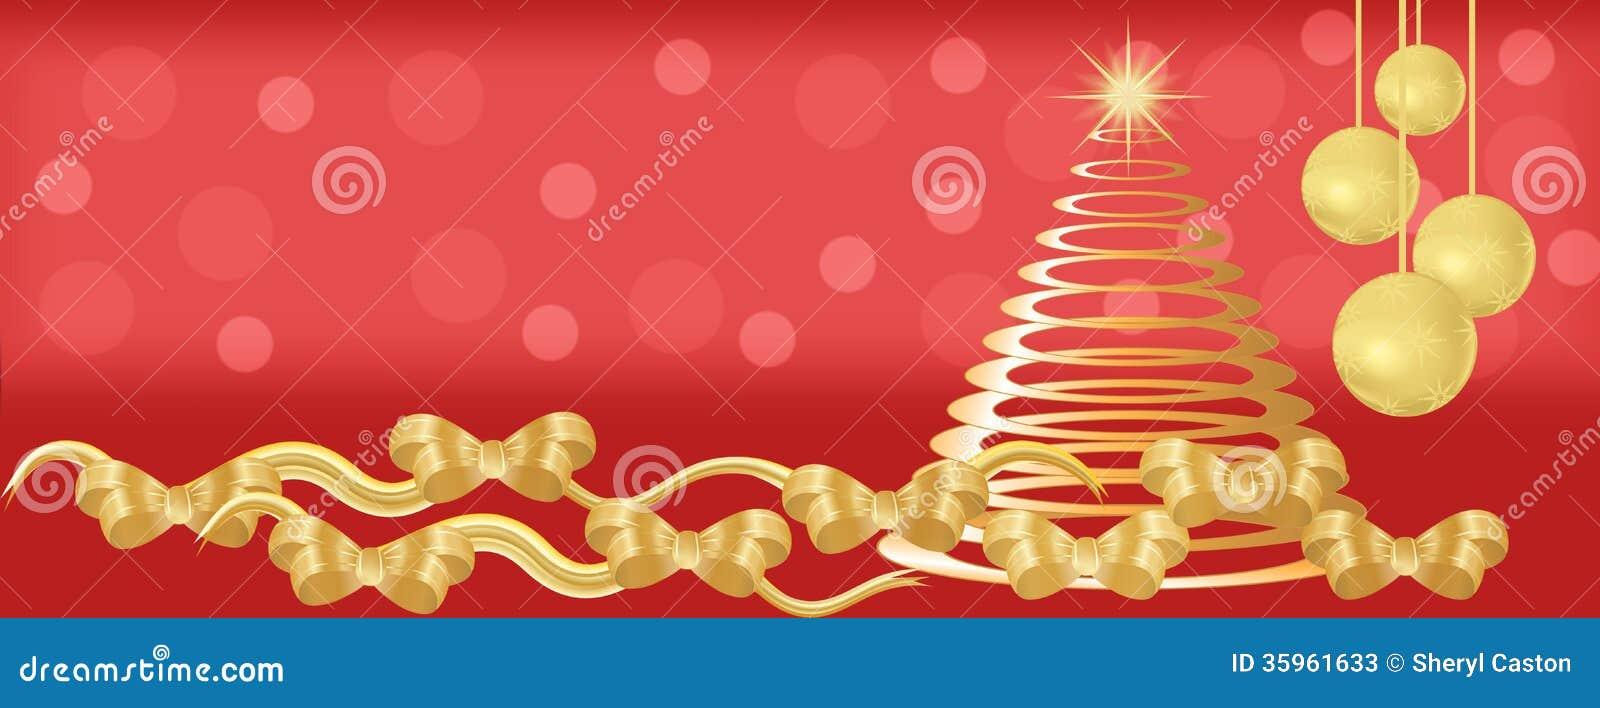 Star Christmas Tree Decorations